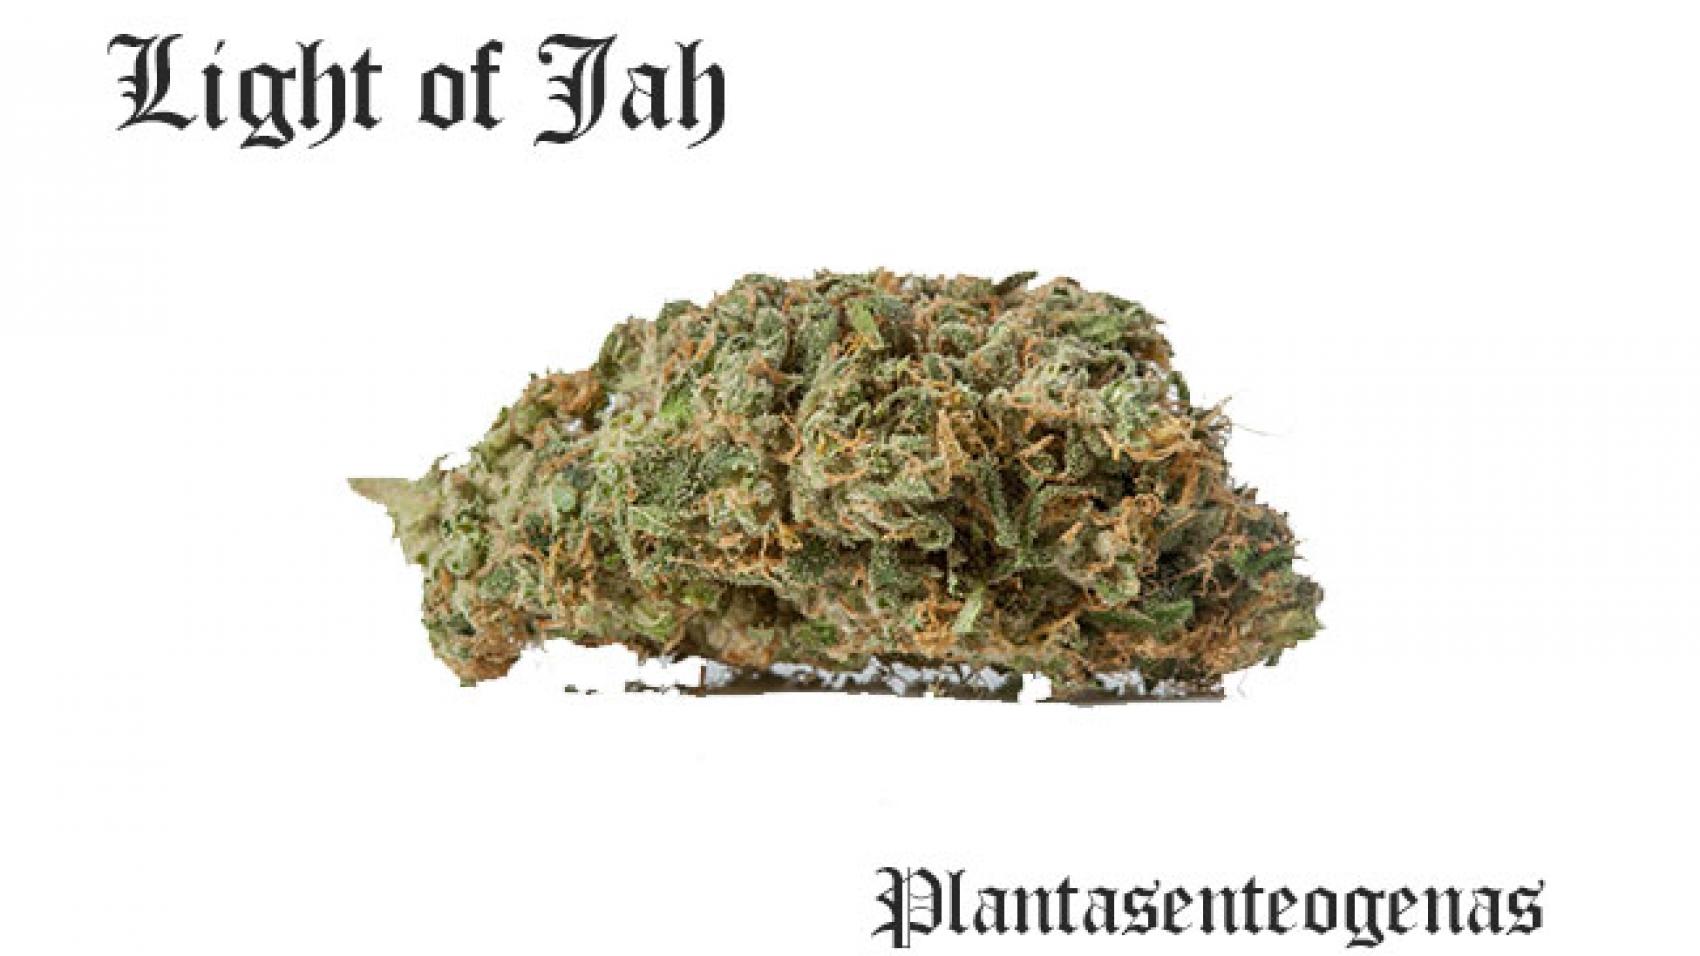 The Light of Jah .